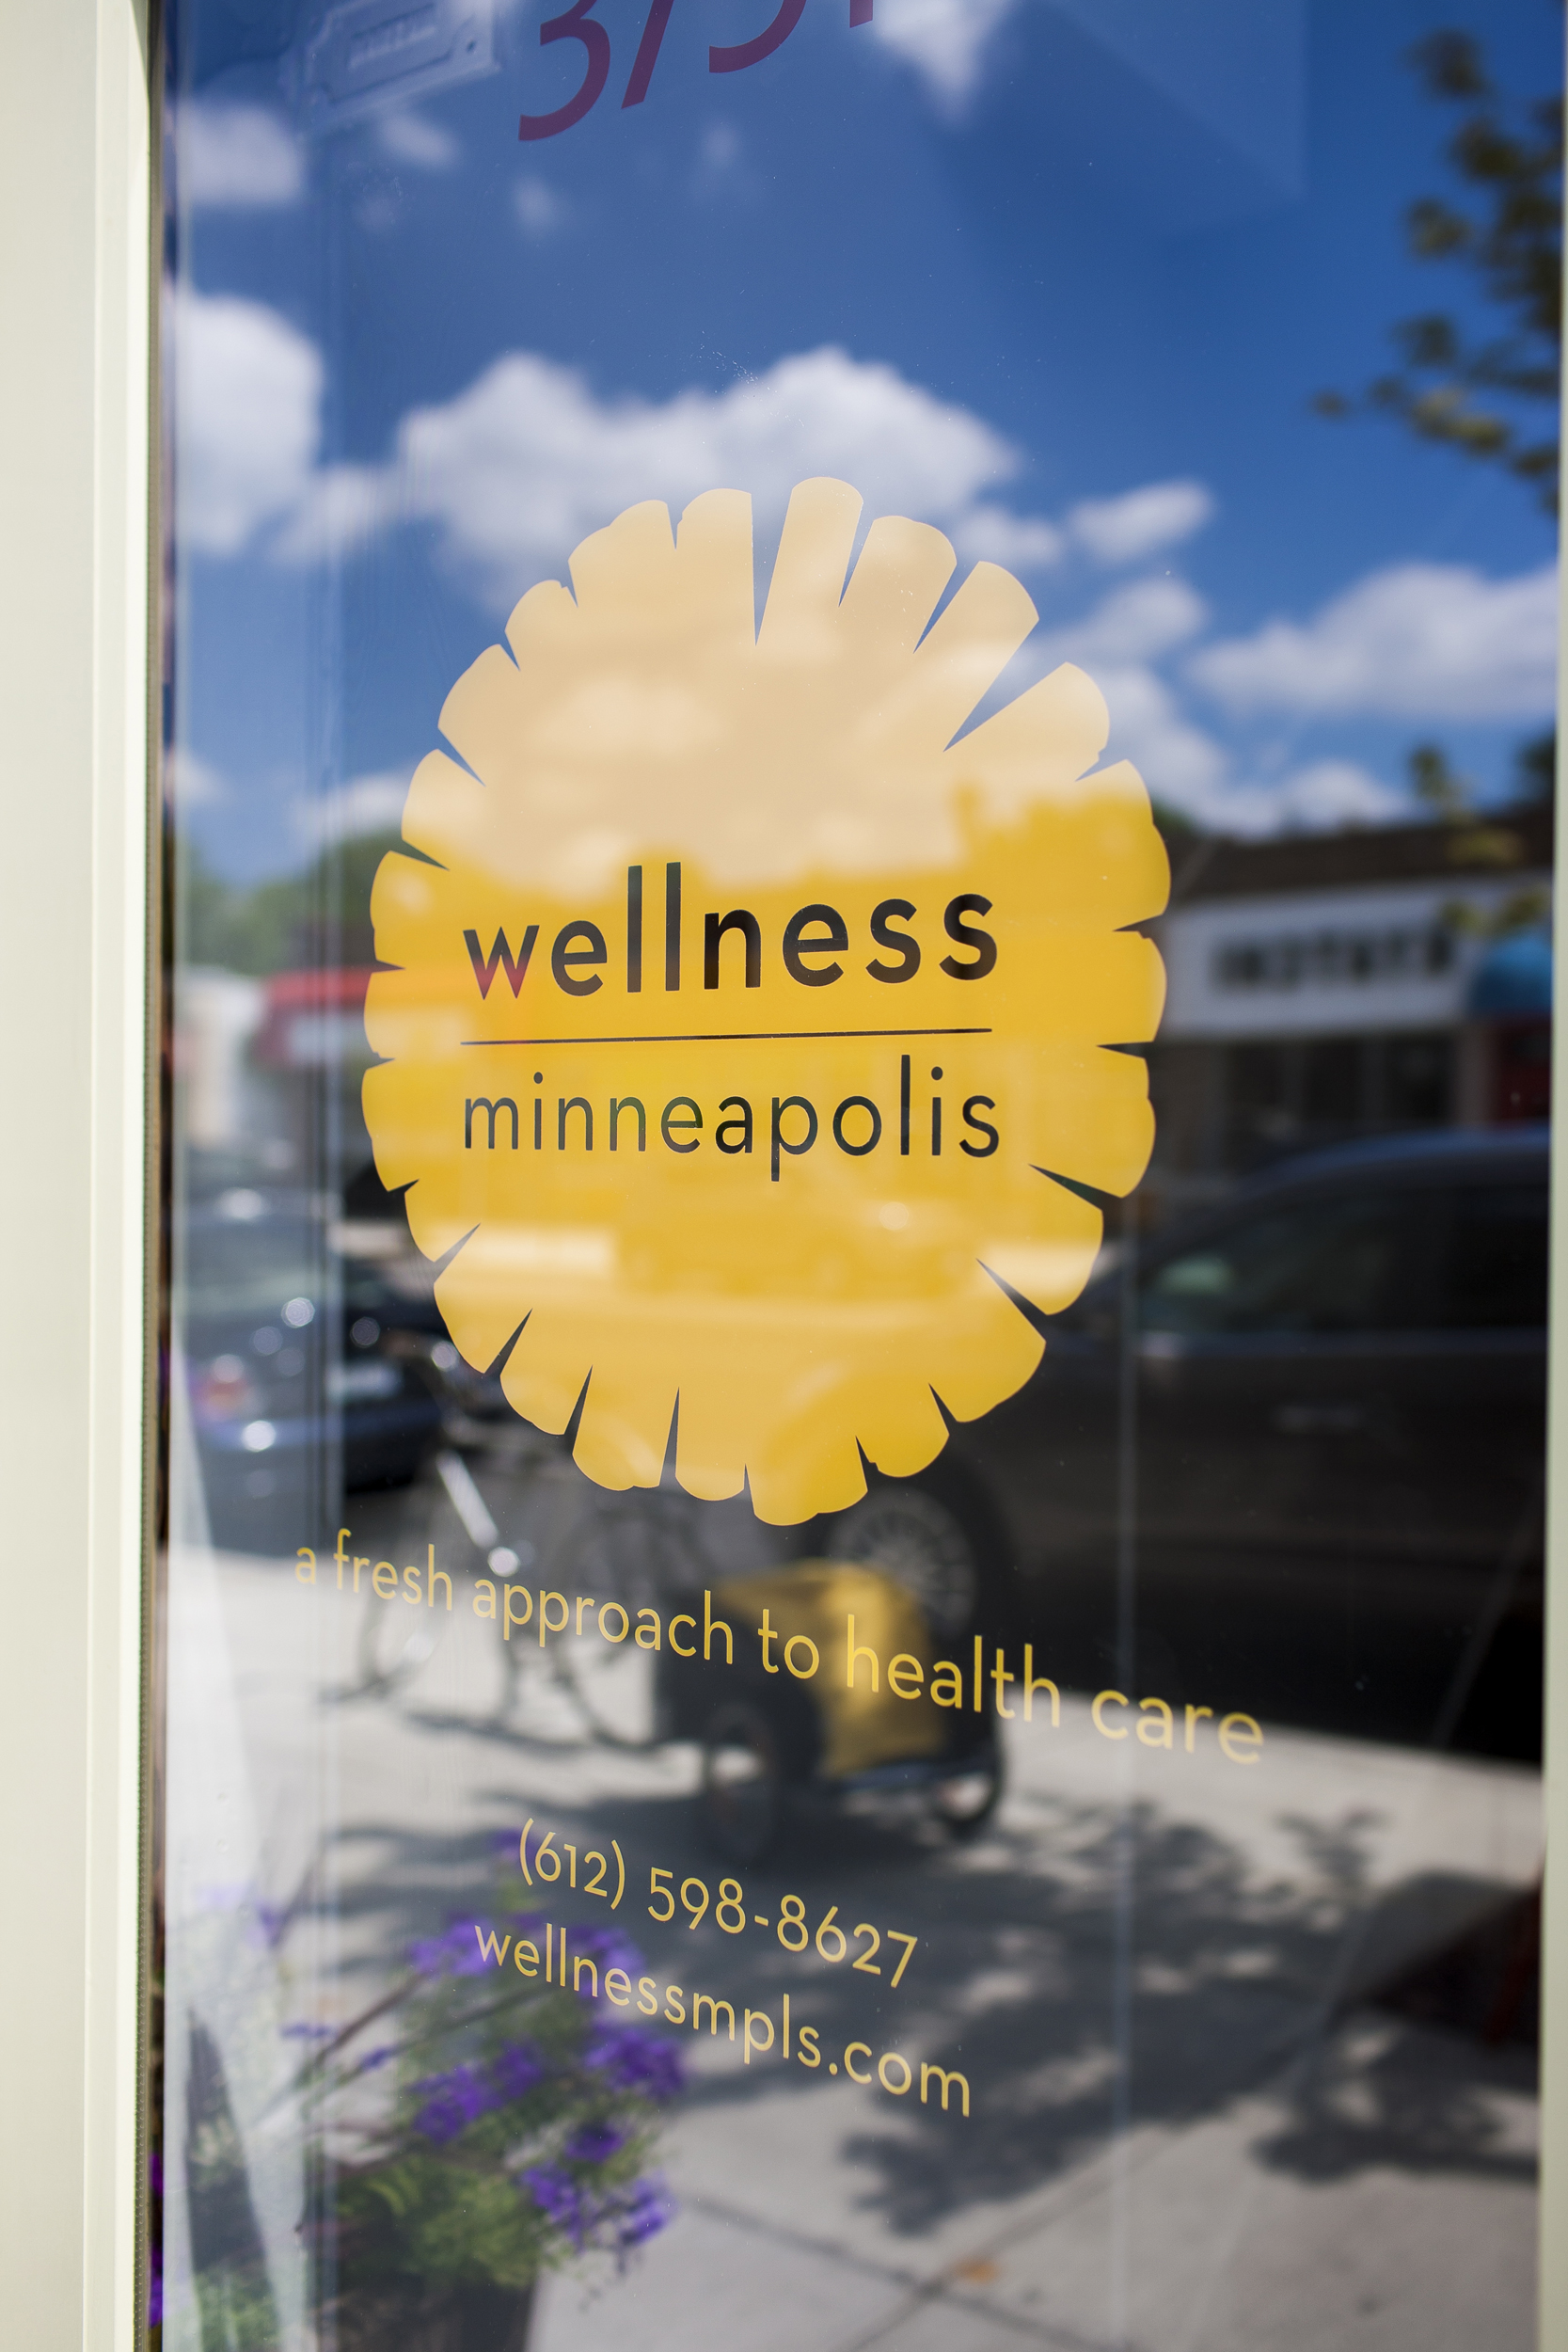 Wellness Minneapolis_002.jpg